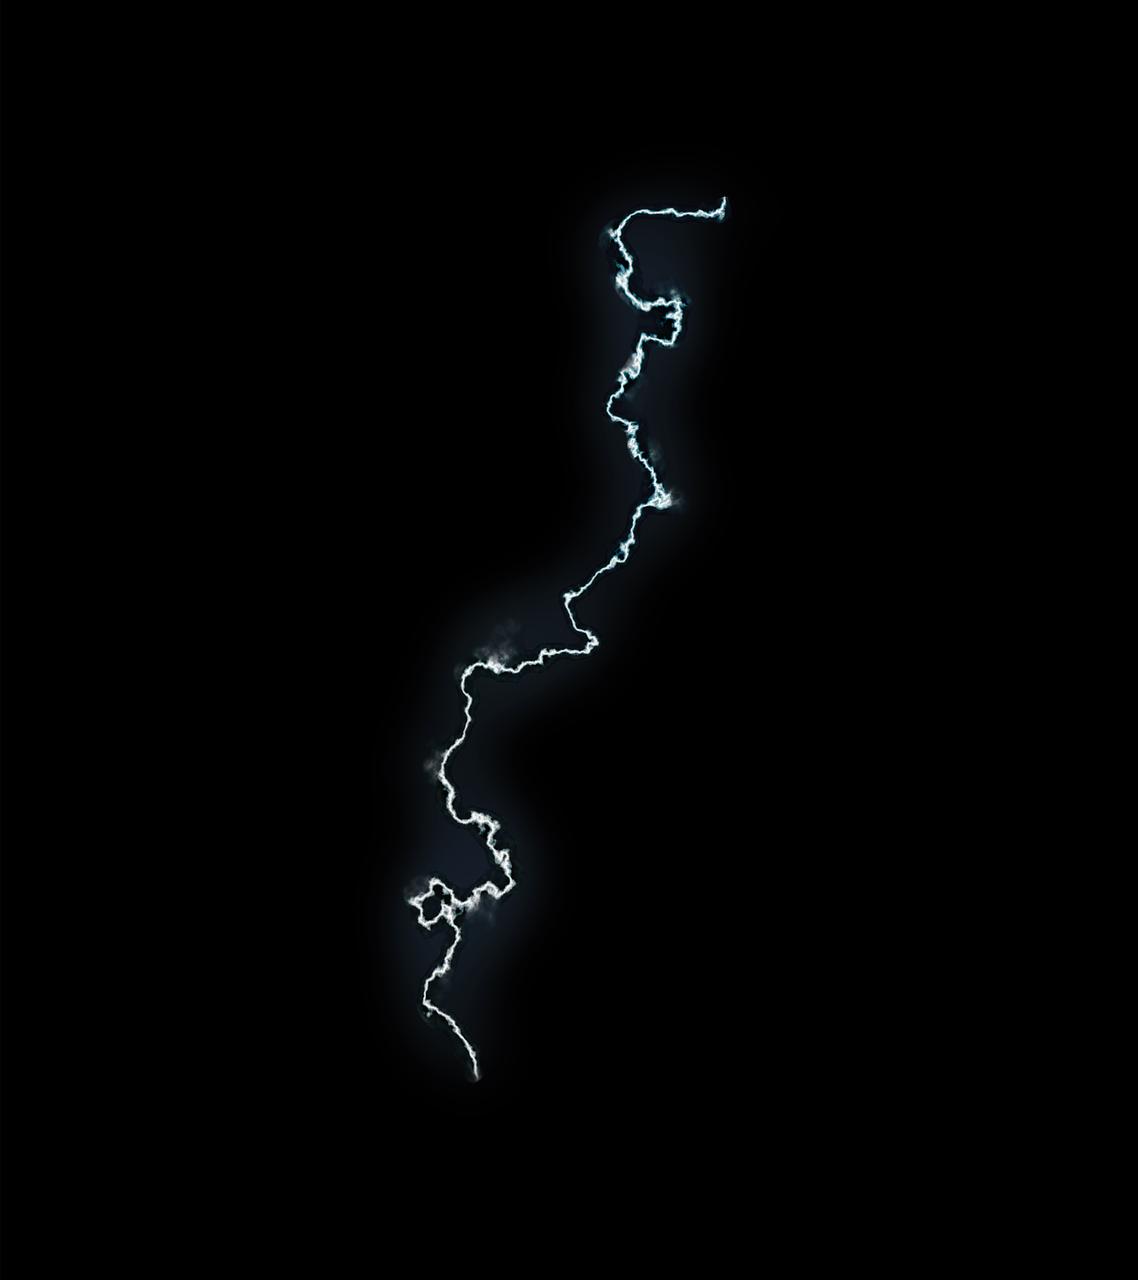 Lightning Bolt Storm Free Image On Pixabay